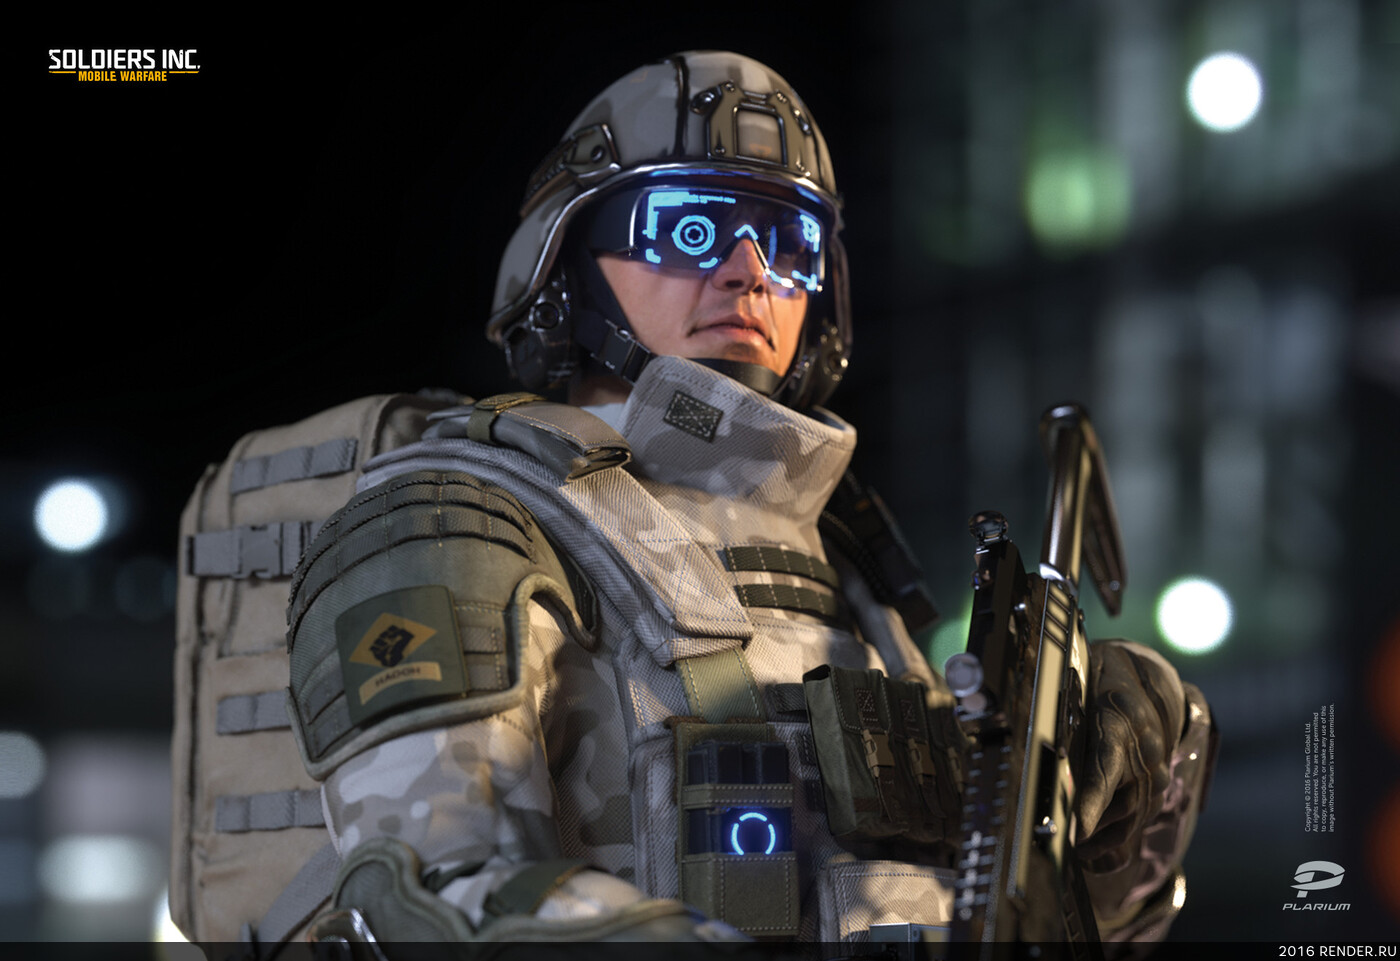 digital 3d, digital sculpture, character, soldiers, future soldiers, sci-fi, Plarium